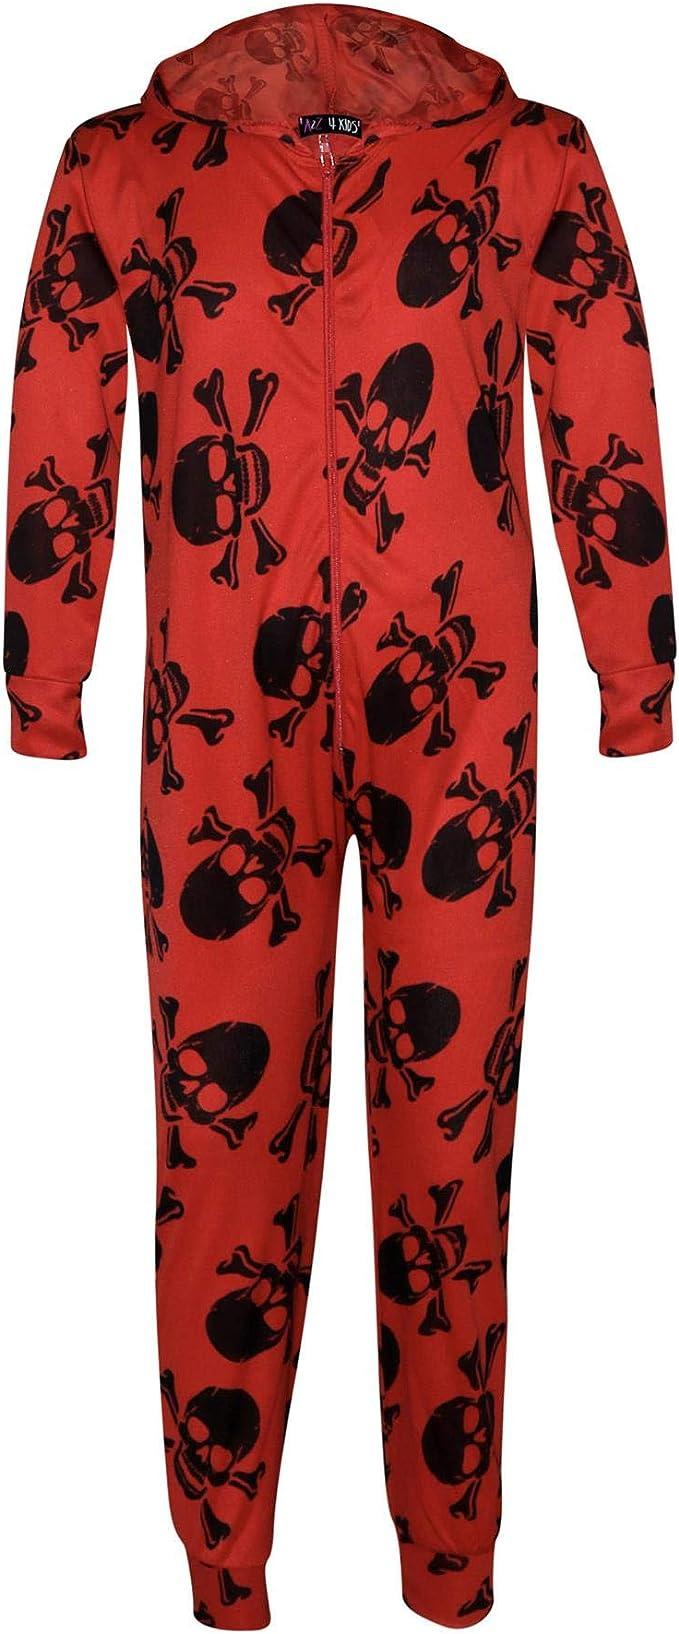 Kids Boys Girls Skeleton Print A2Z Onesie One Piece Halloween Costume 5-13 Years